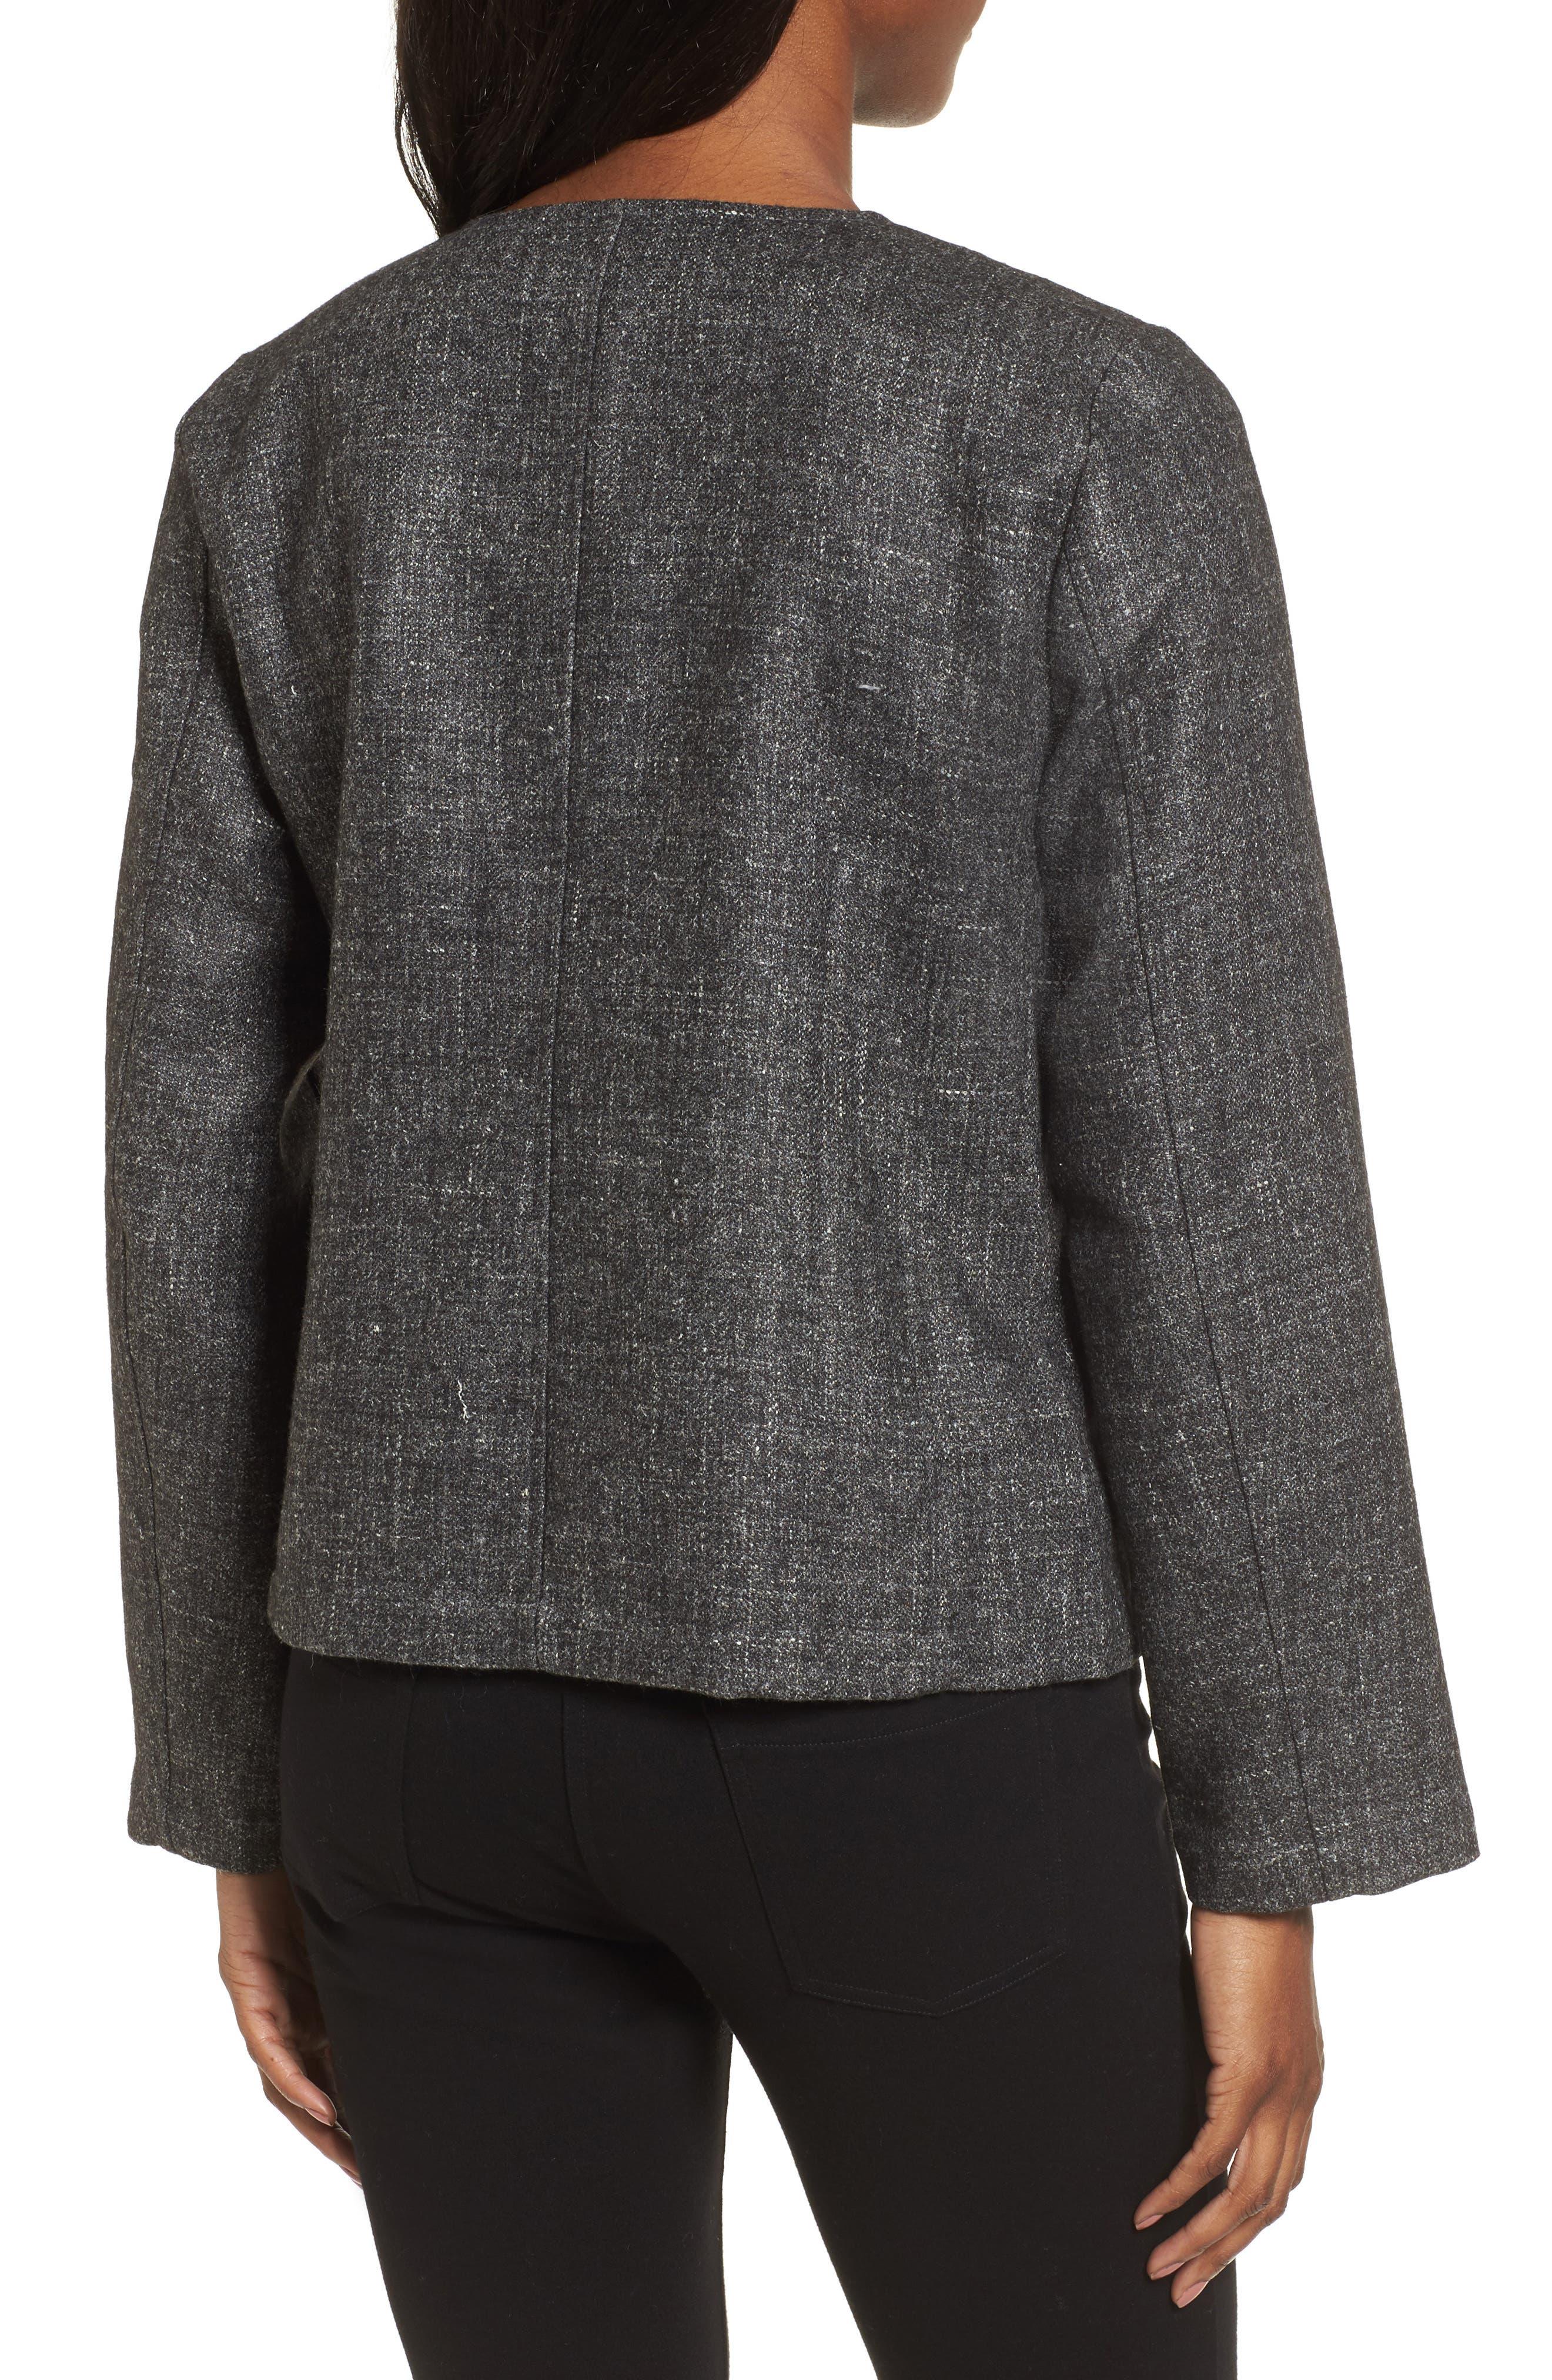 Alternate Image 2  - Eileen Fisher Tweed Jacket (Nordstrom Exclusive)